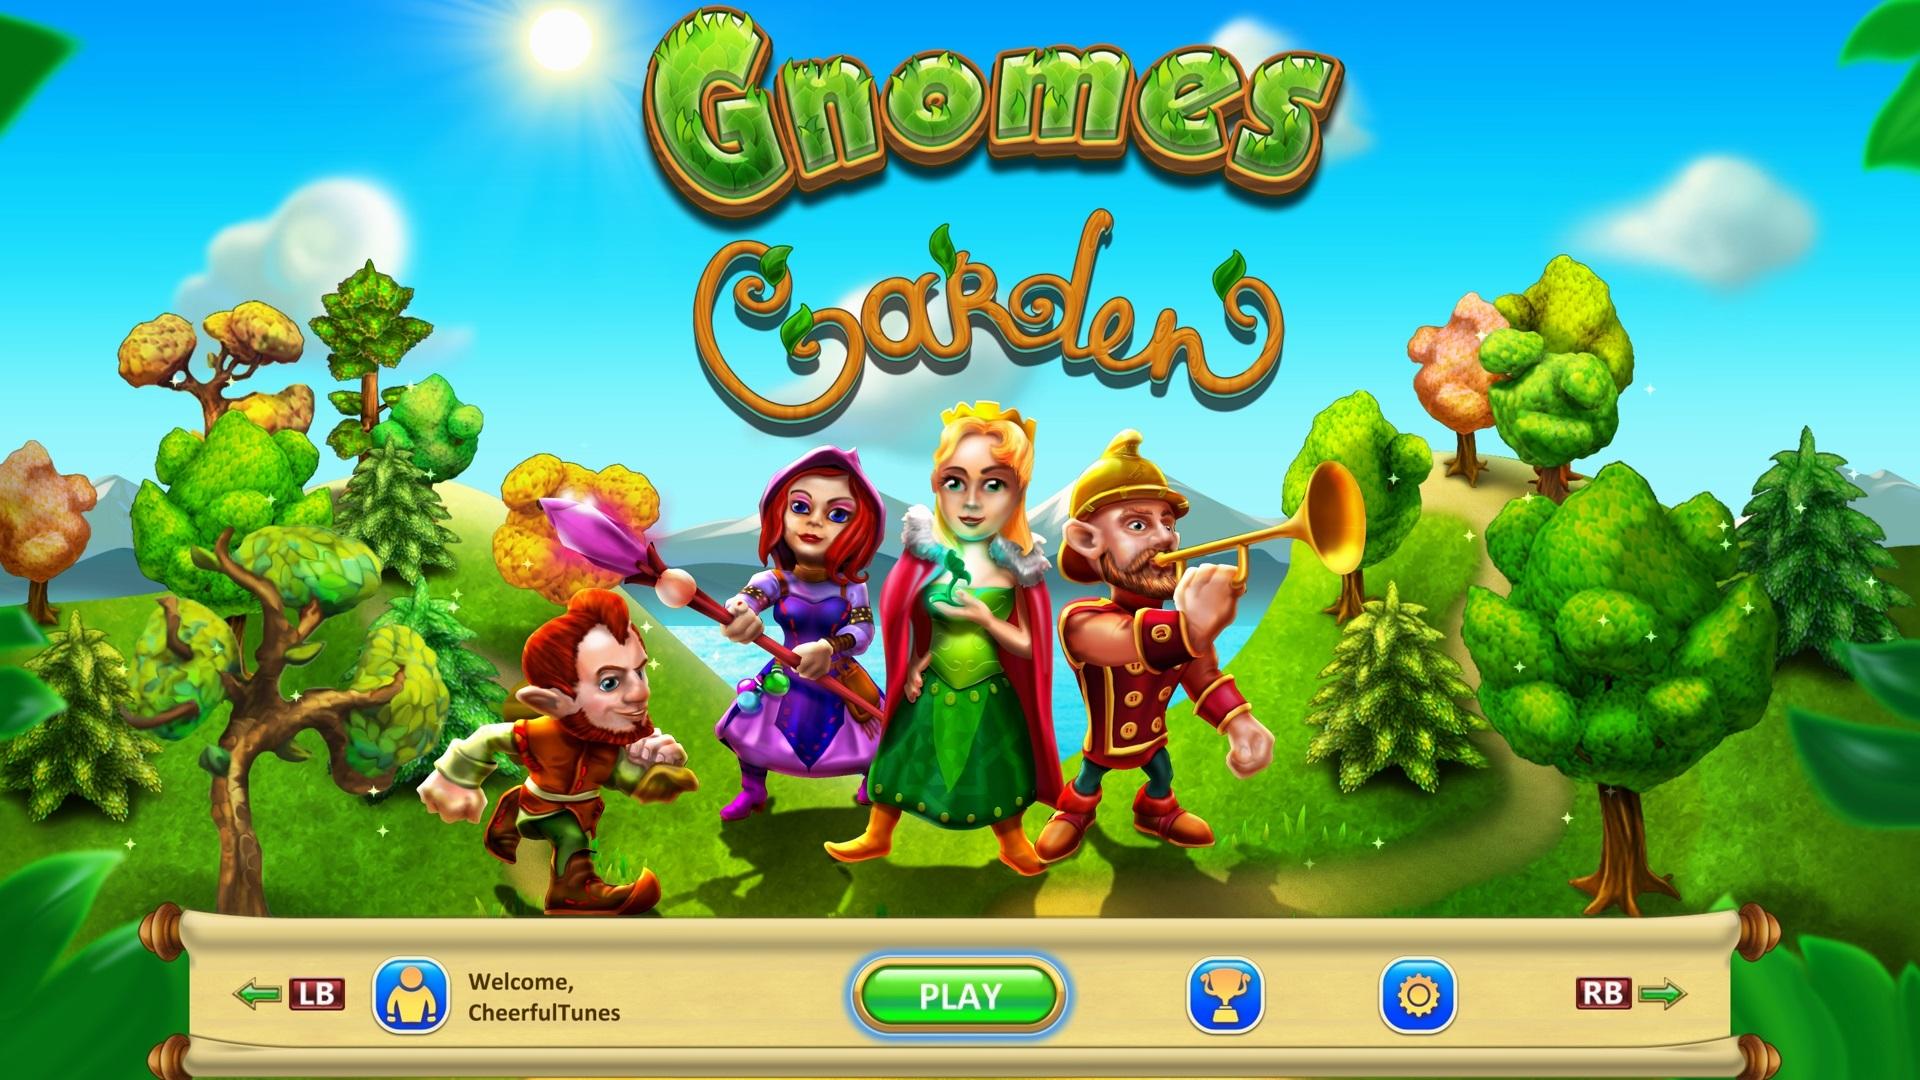 Gnomes_Garden_SS_2.jpg